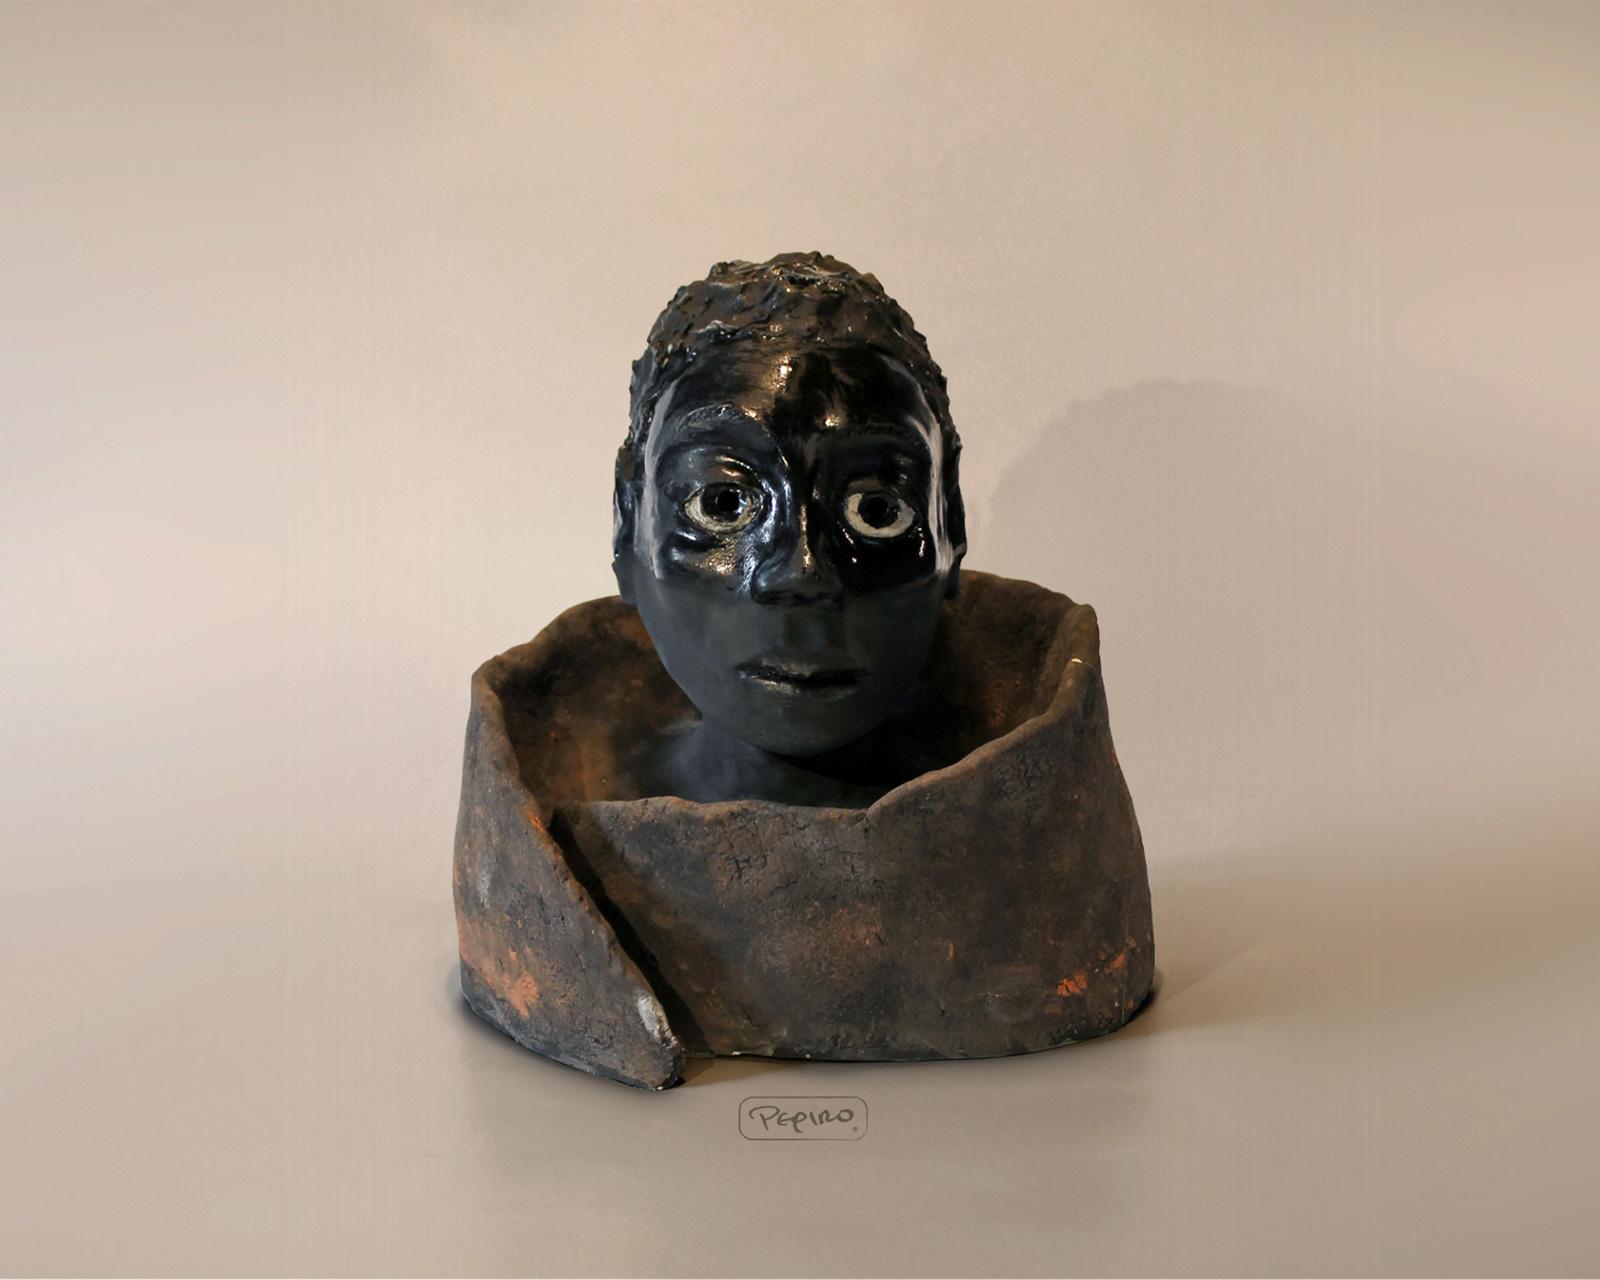 pepiro_van_roncha ceramic piece 'untitled bust'